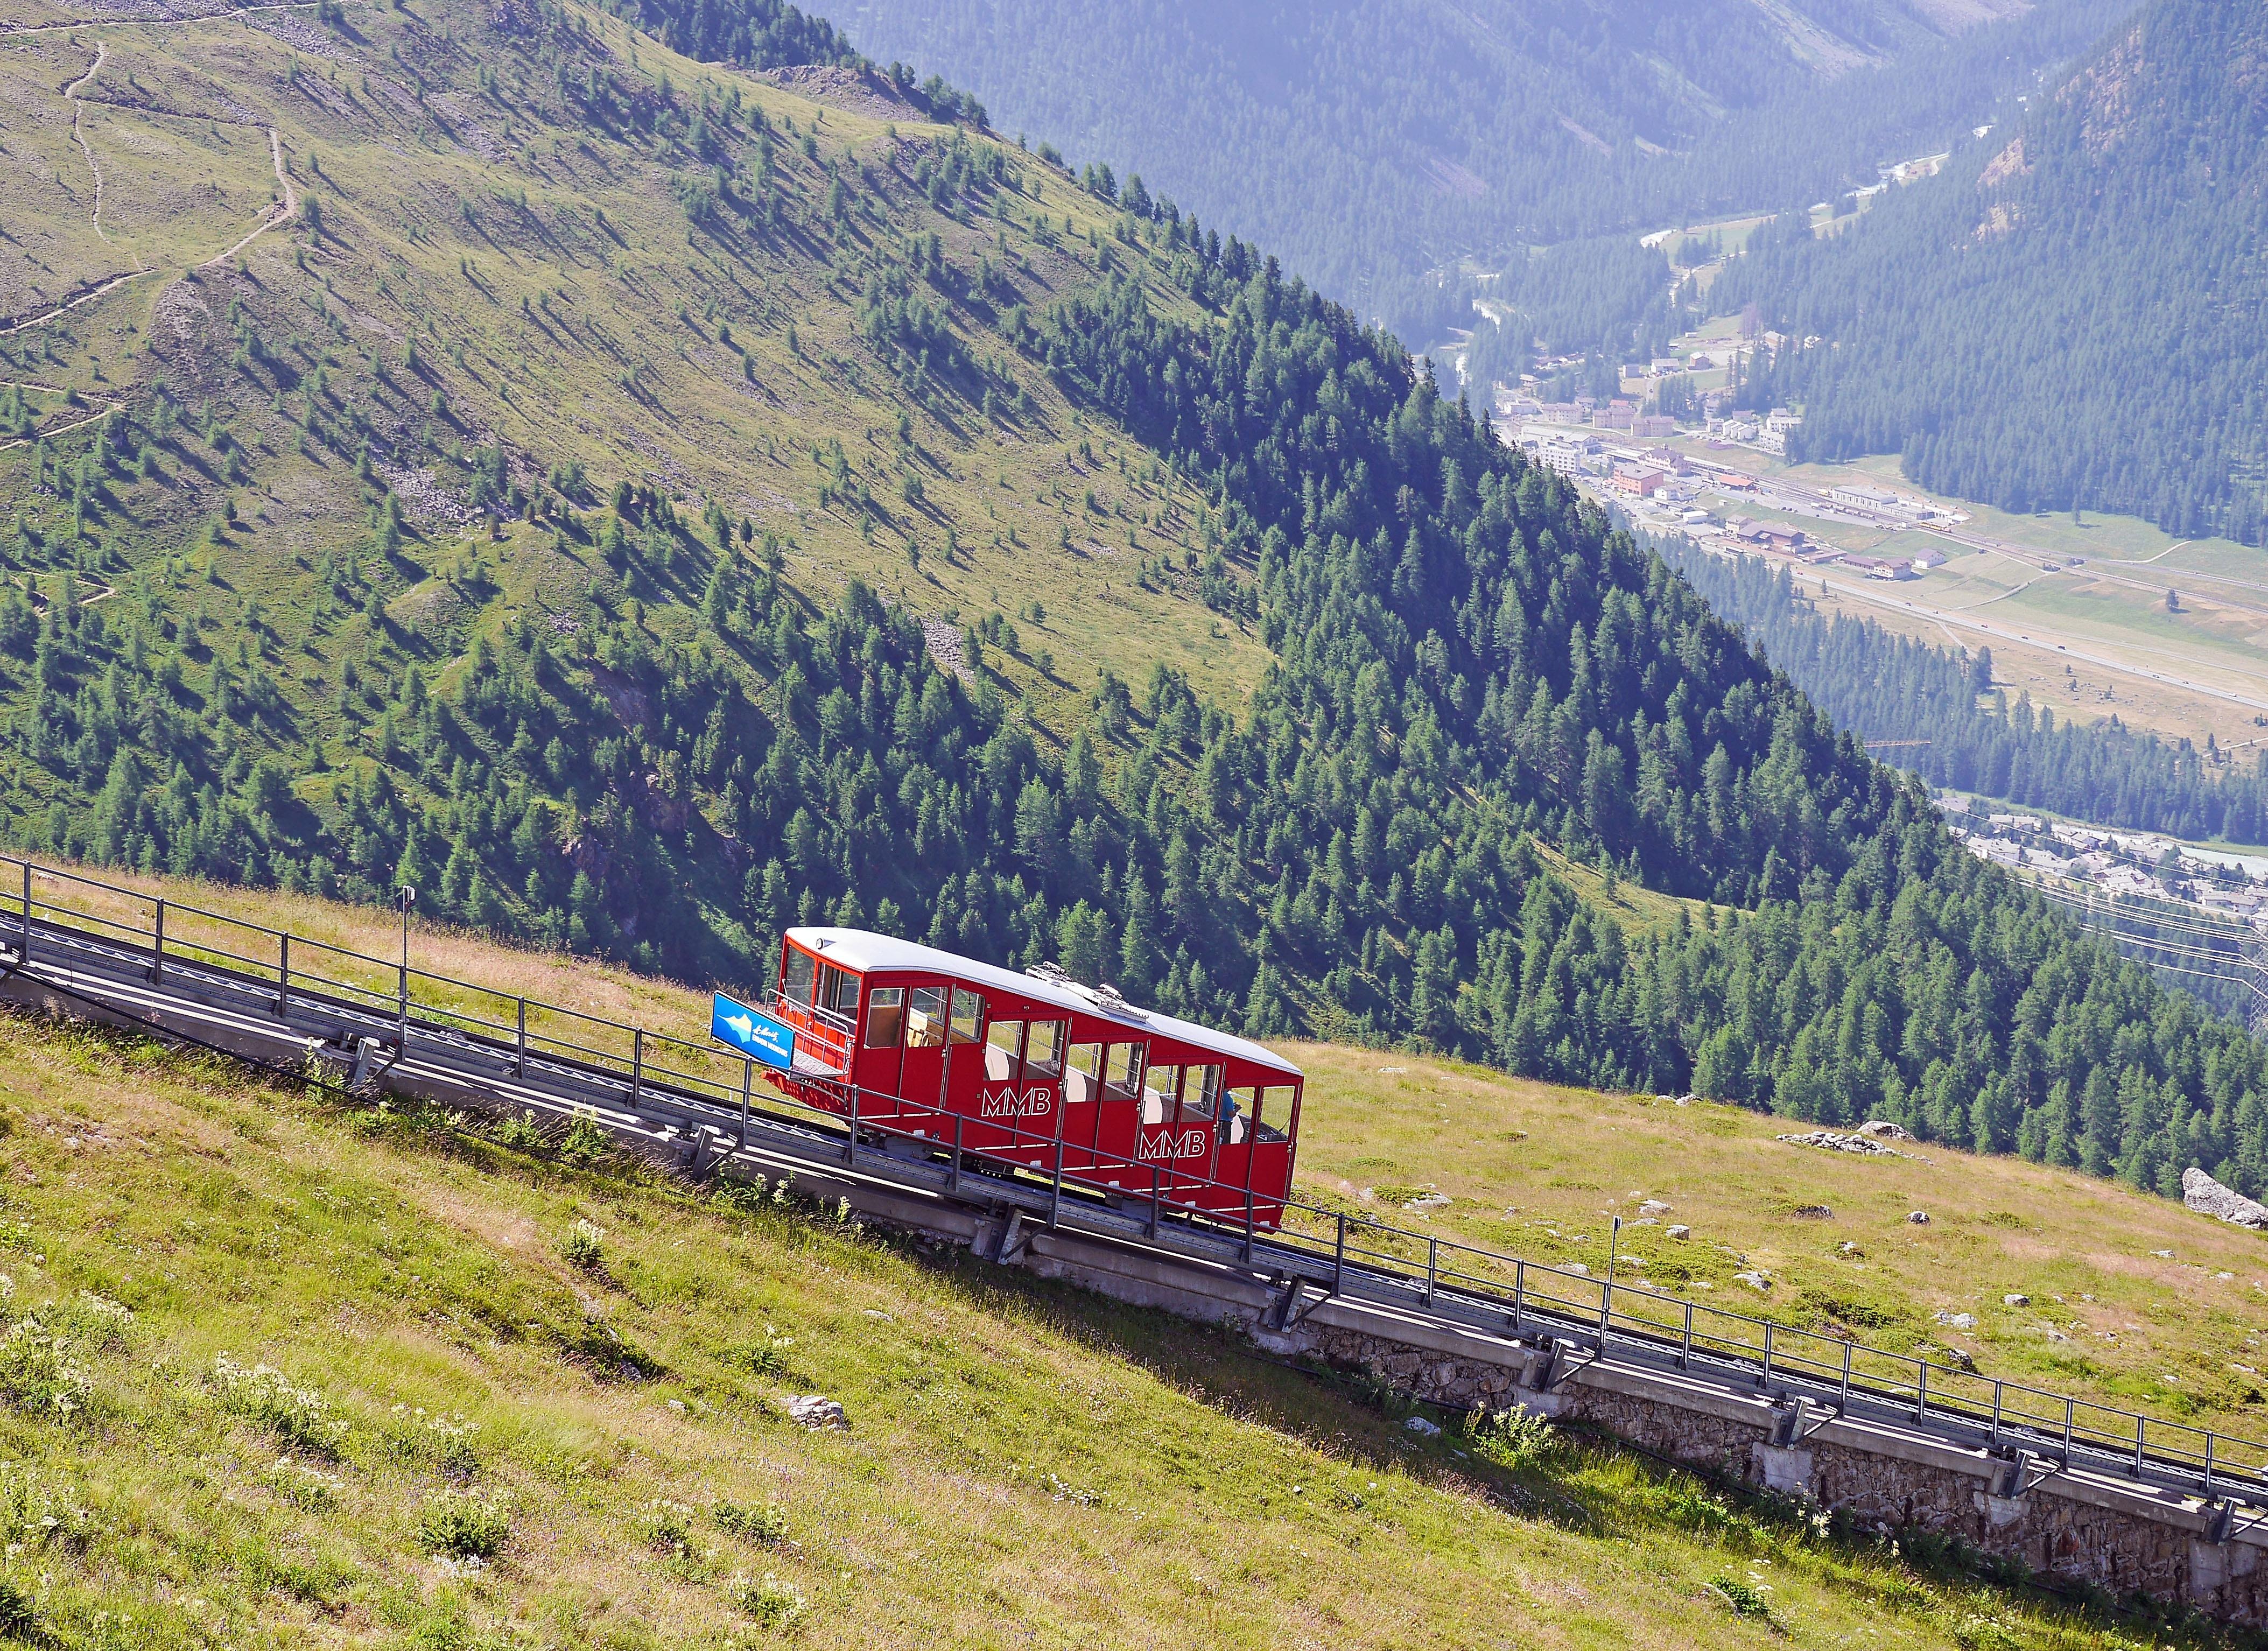 Free Images : track, train, mountain range, summer, vehicle